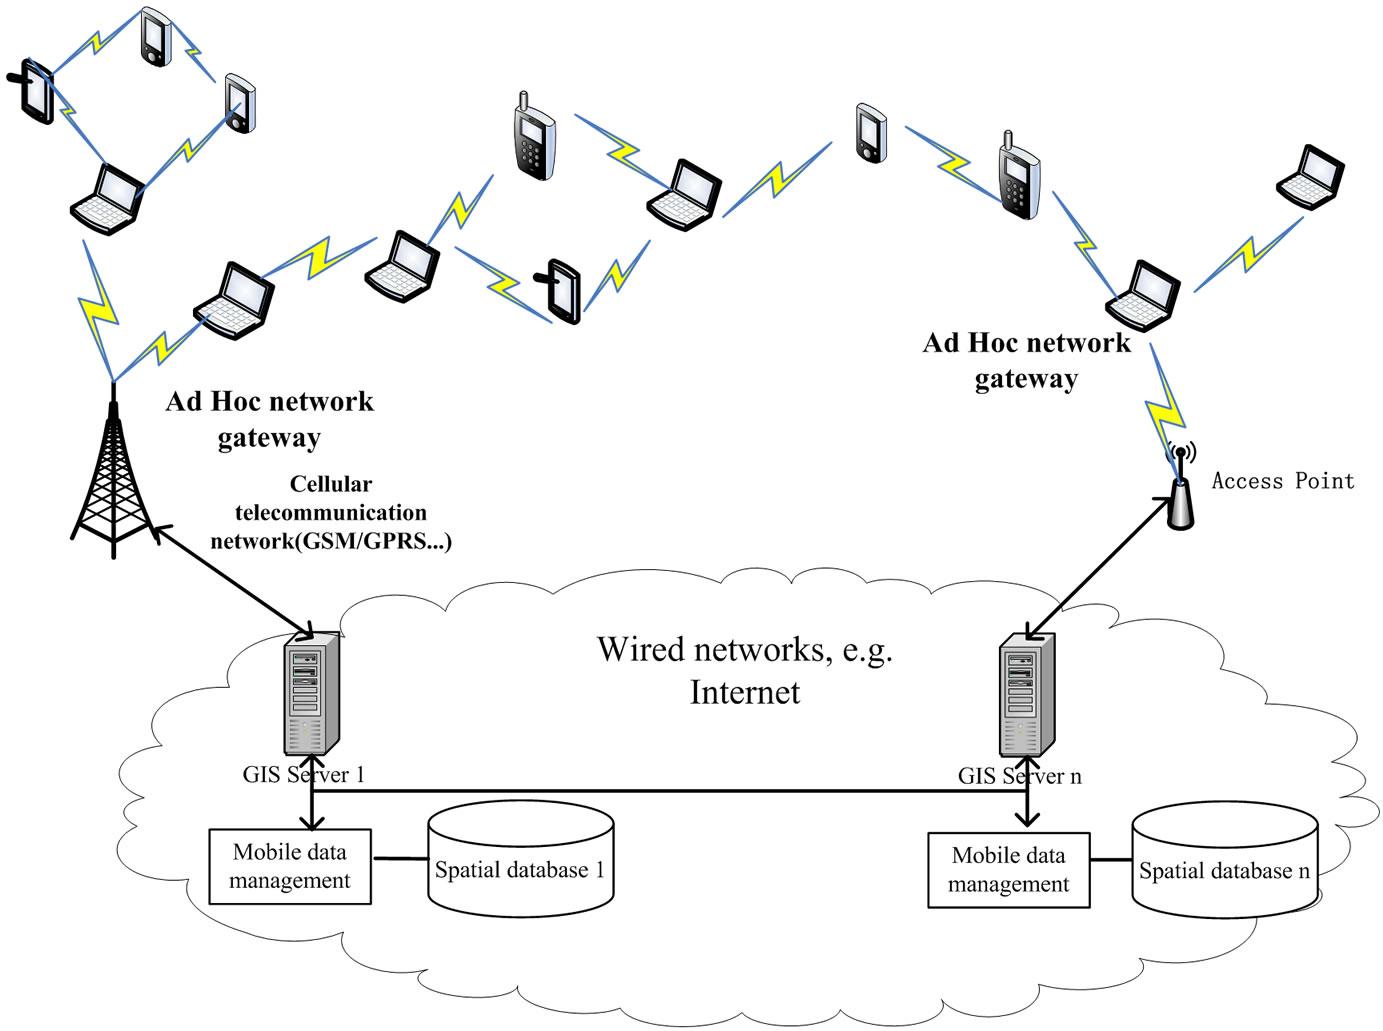 Ad Hoc Network